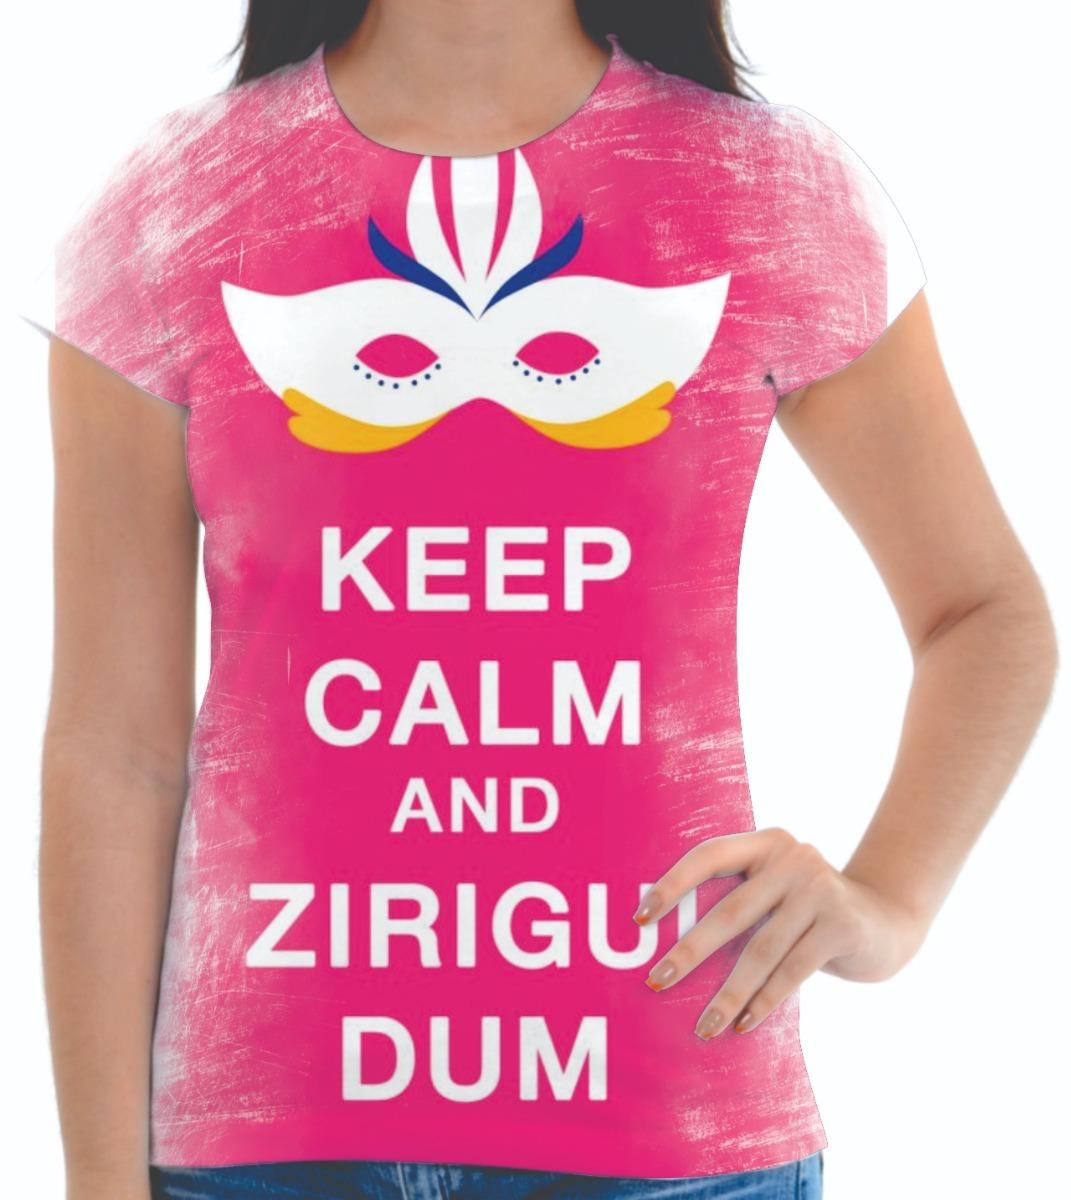 Baby Look Blusa Feminina Personalizada Carnaval Keep Calm 01 - R  51 ... 8d123d1e8f9